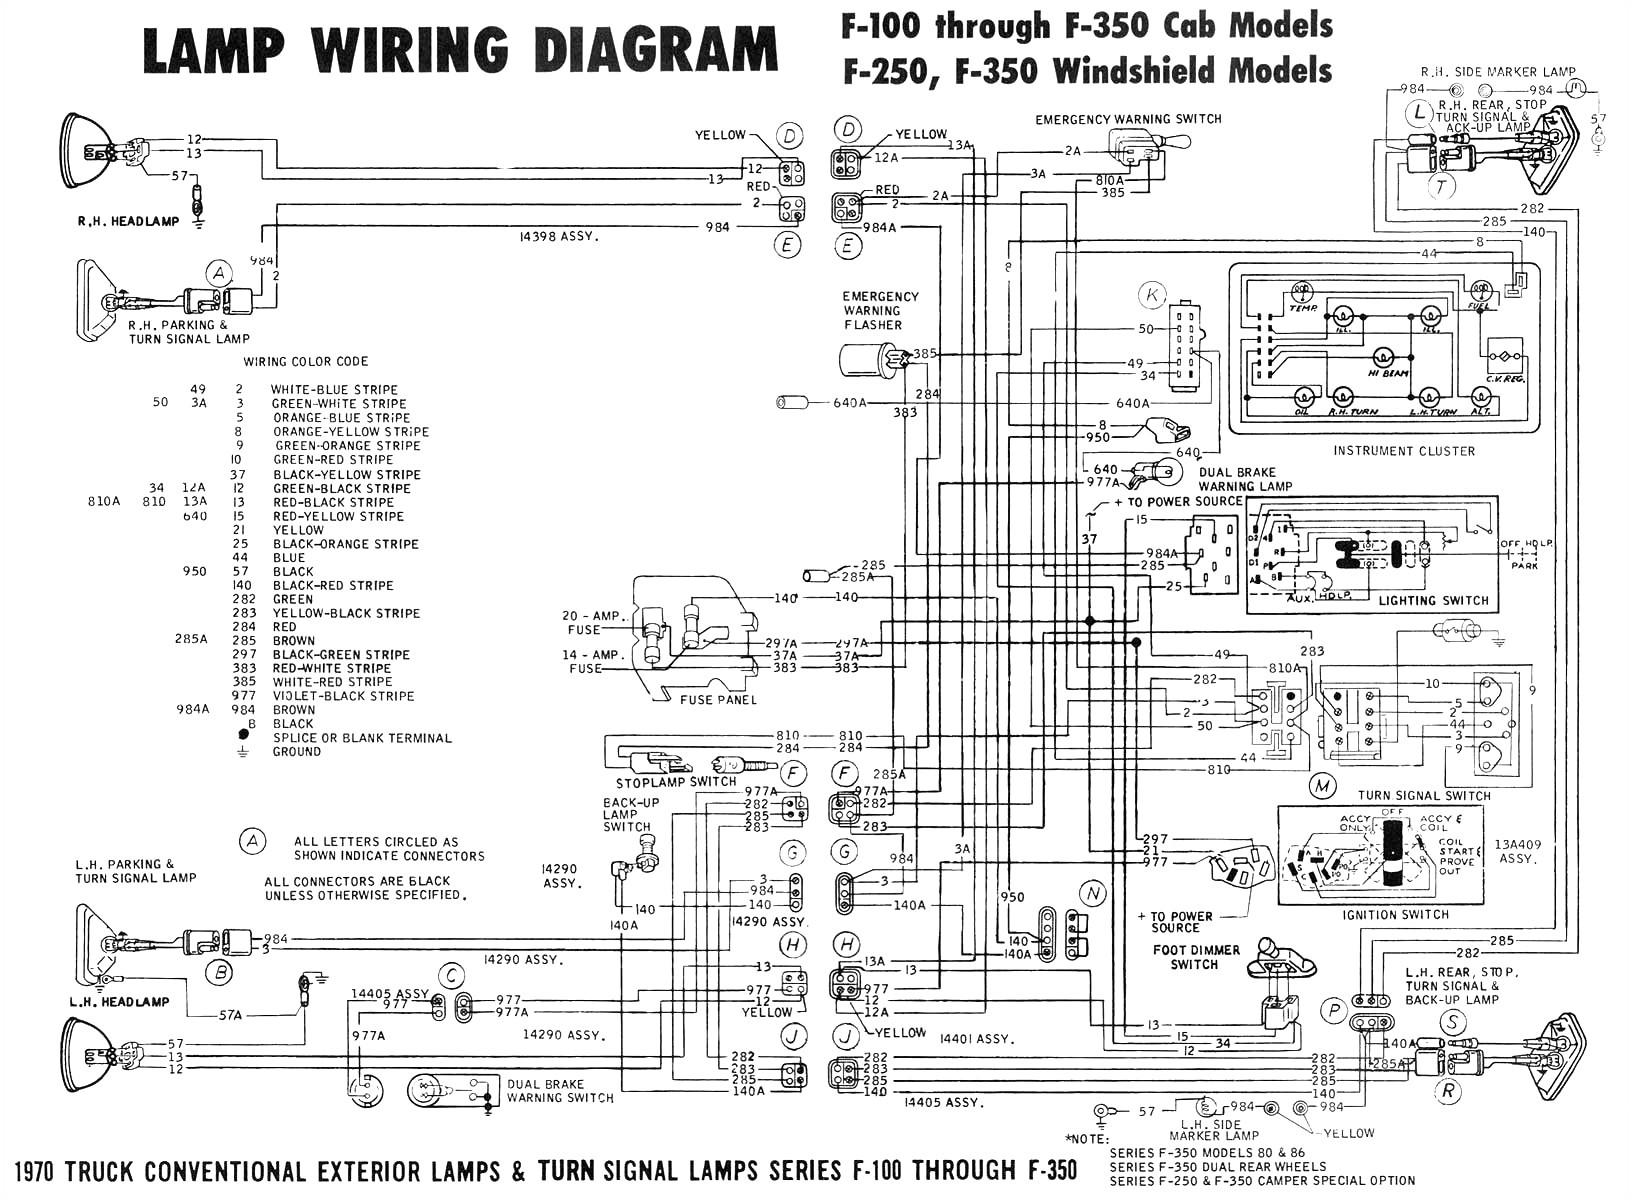 165 ecm wiring diagram wiring diagram article review 165 ecm wiring diagram wiring diagramsgm ecm wiring